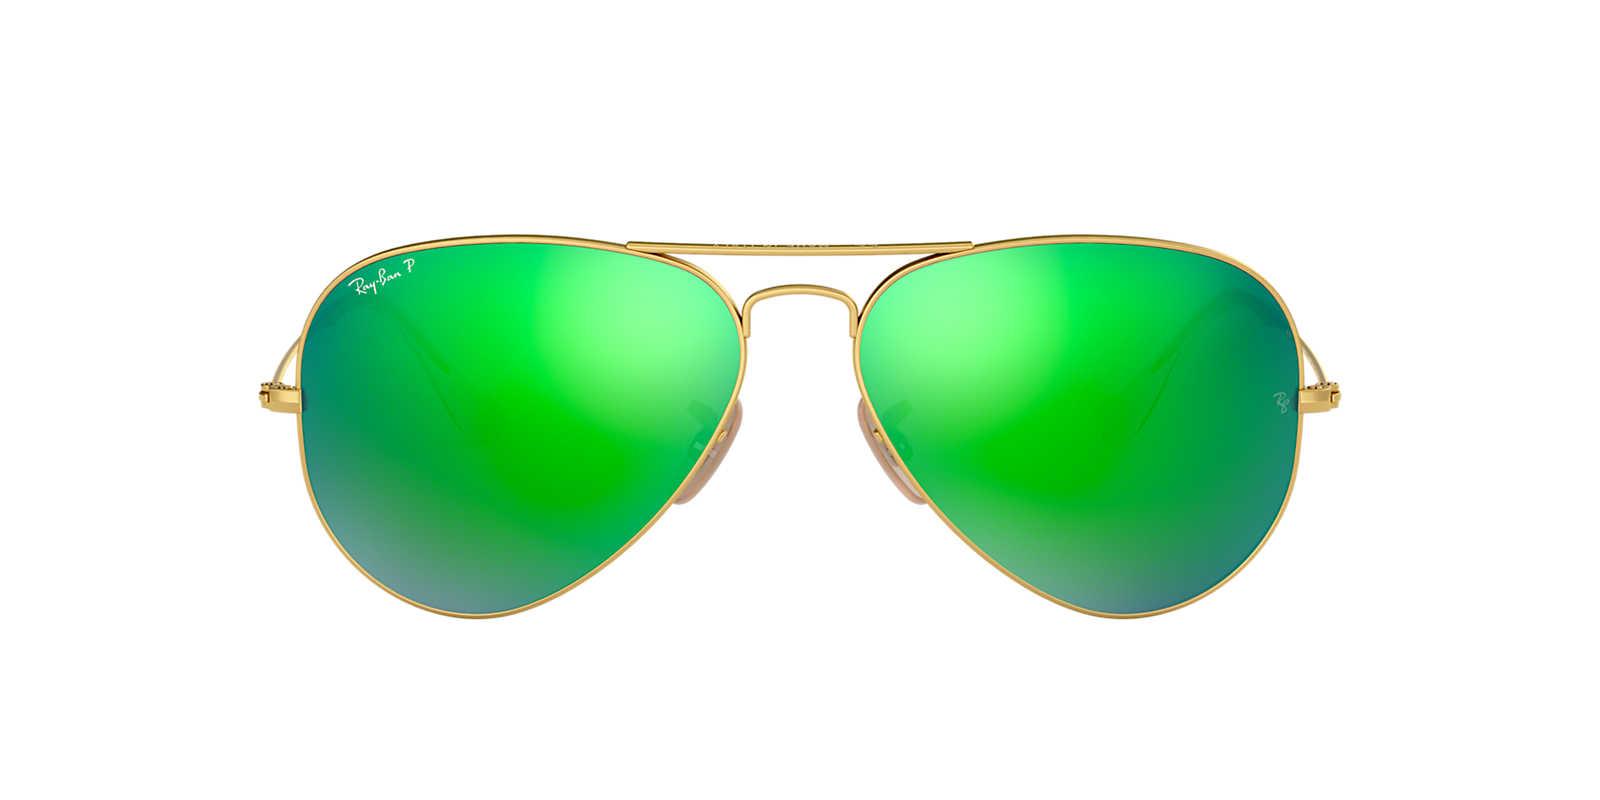 ray ban matte gold aviator  Ray-Ban RB3025 58 ORIGINAL AVIATOR 58 Green \u0026 Gold Matte Polarized ...